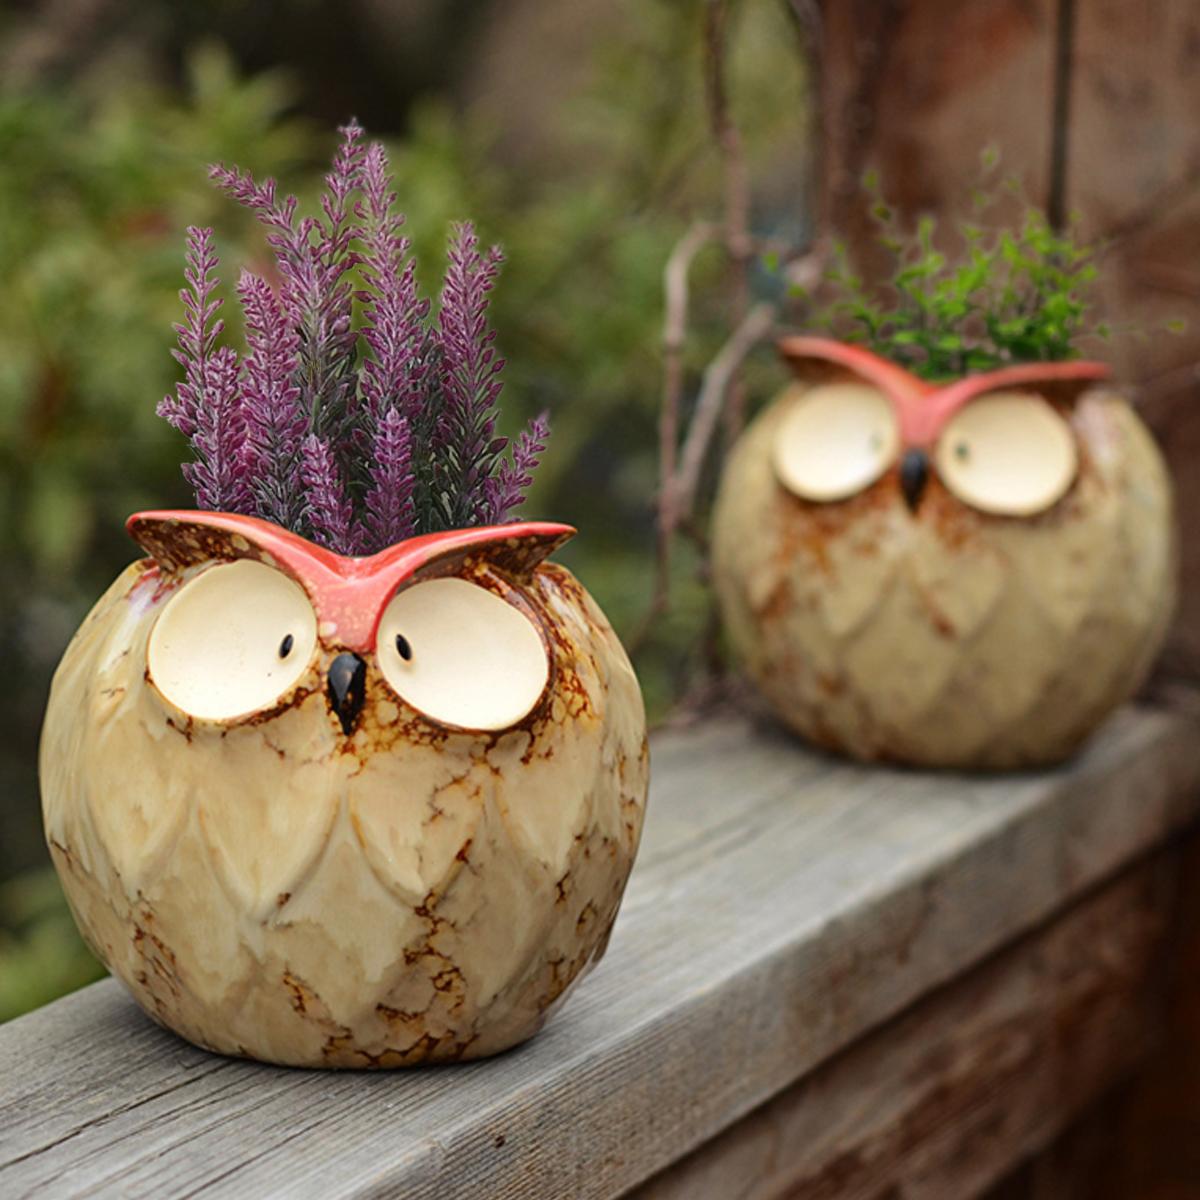 Garden Succulent Plant Flower Pot MIni Owl Shape Ceramic Planter Nursery Decorations 4 Inch